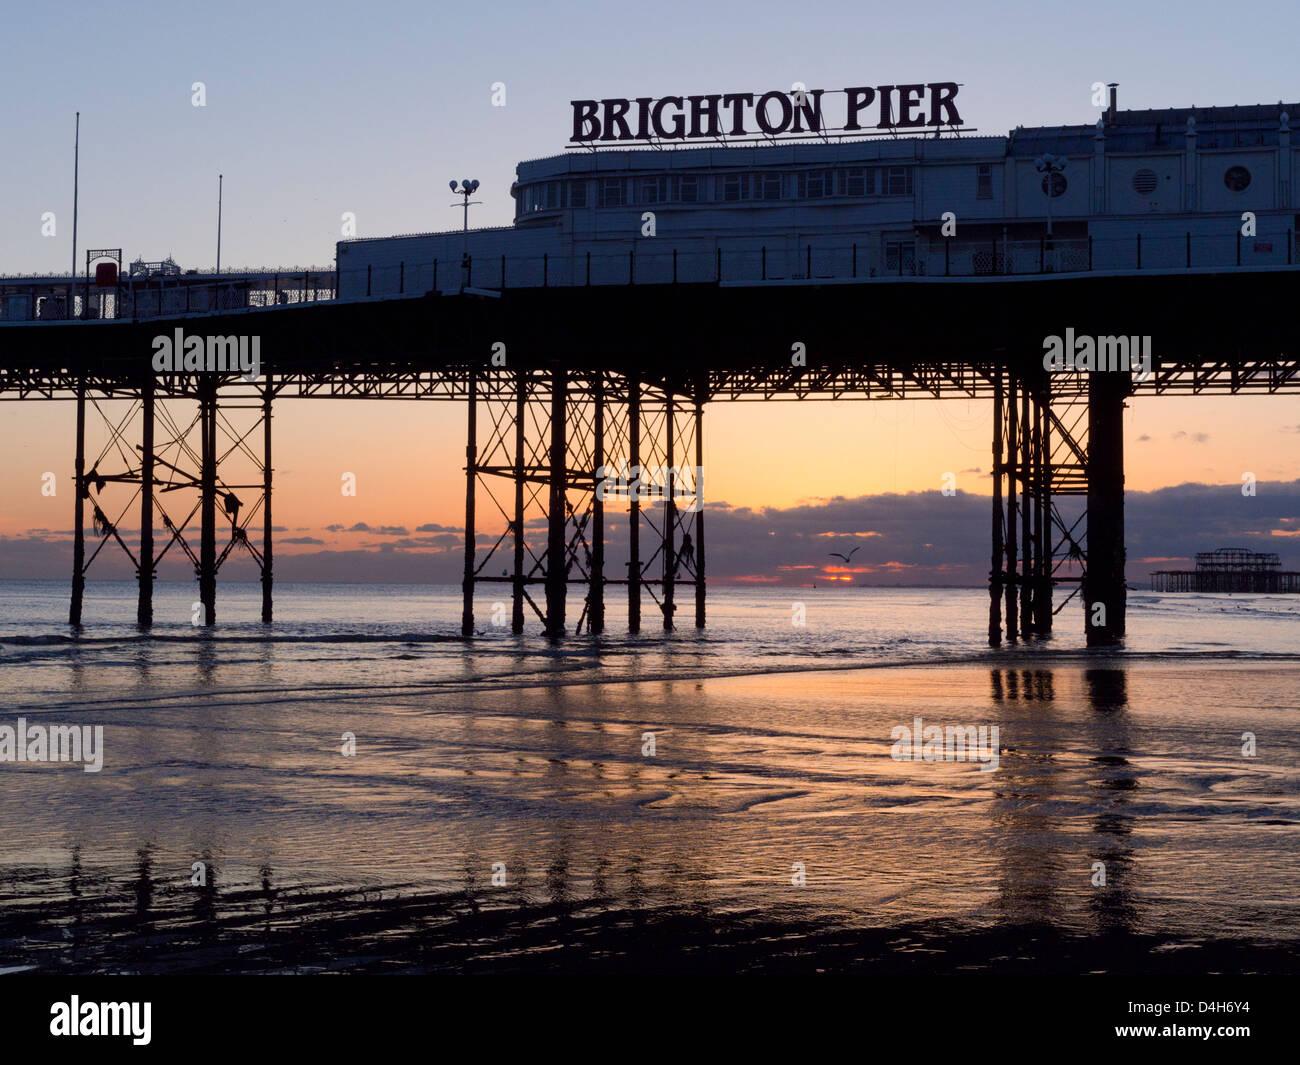 Brighton Pier bei Sonnenuntergang, goldenen Himmel reflektiert den Sand bei Ebbe Stockbild